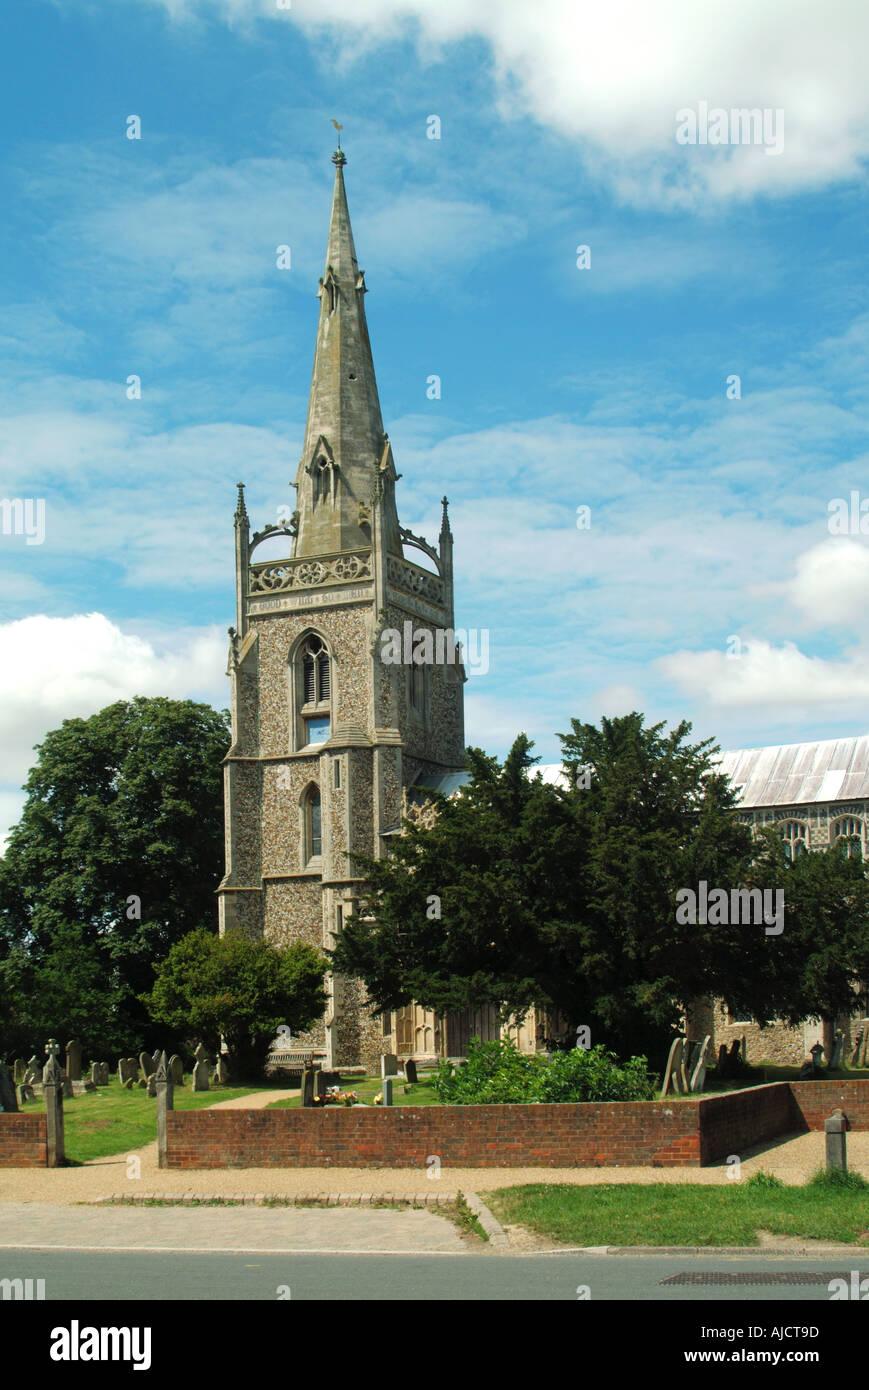 Woolpit parish church - Stock Image